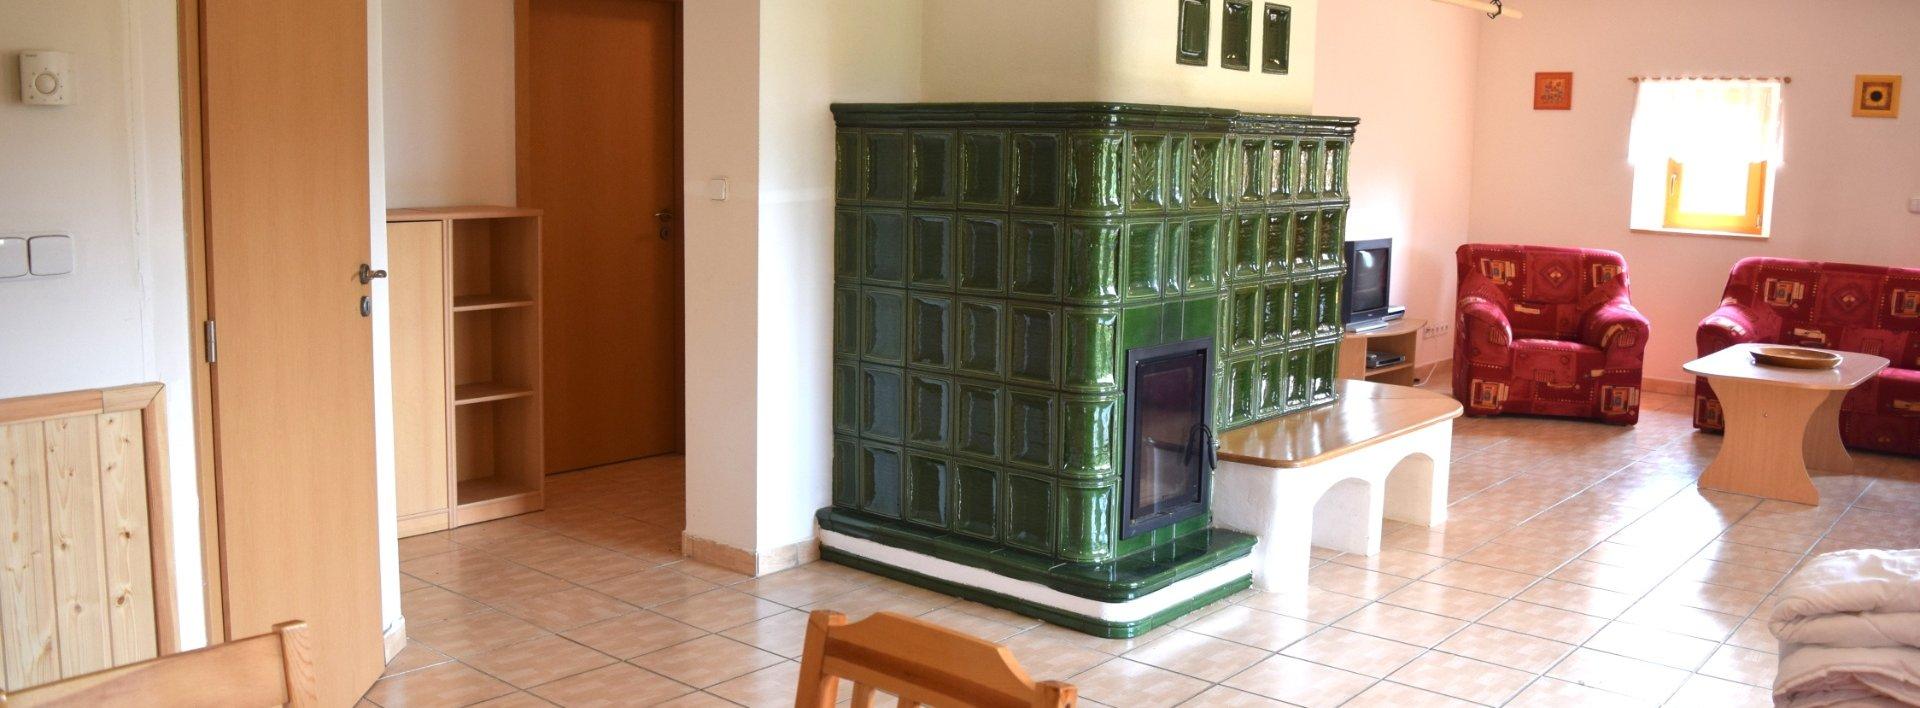 Prodej nízkoenergetického rodinného domu, 116 m² - Desná, Ev.č.: N48801